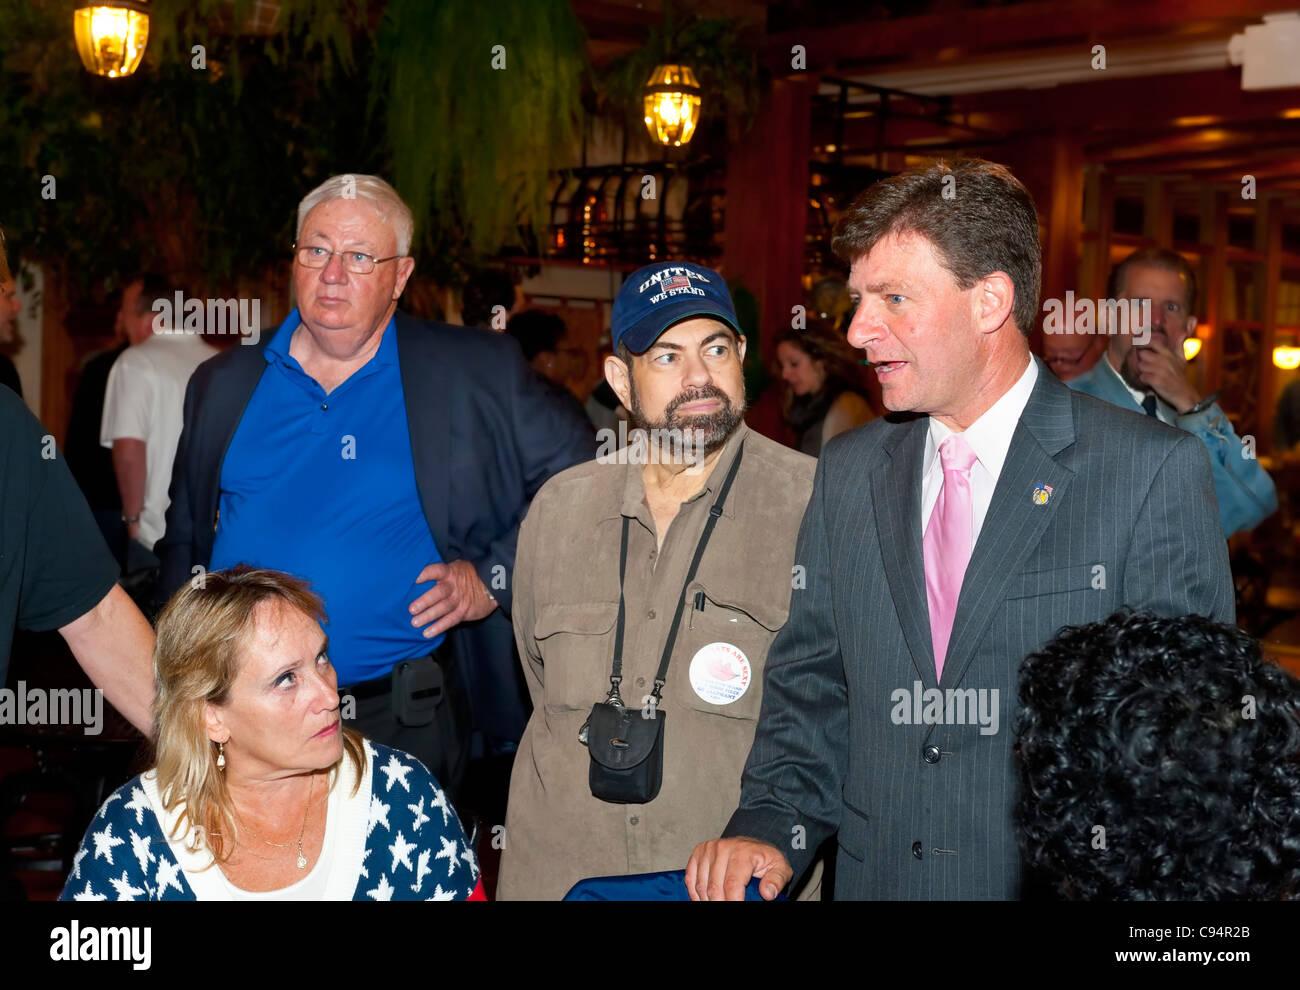 Re-elected Nassau County Legislator Dave Denenberg (D-Merrick) at Democratic Election Night Party, Mineola, New - Stock Image